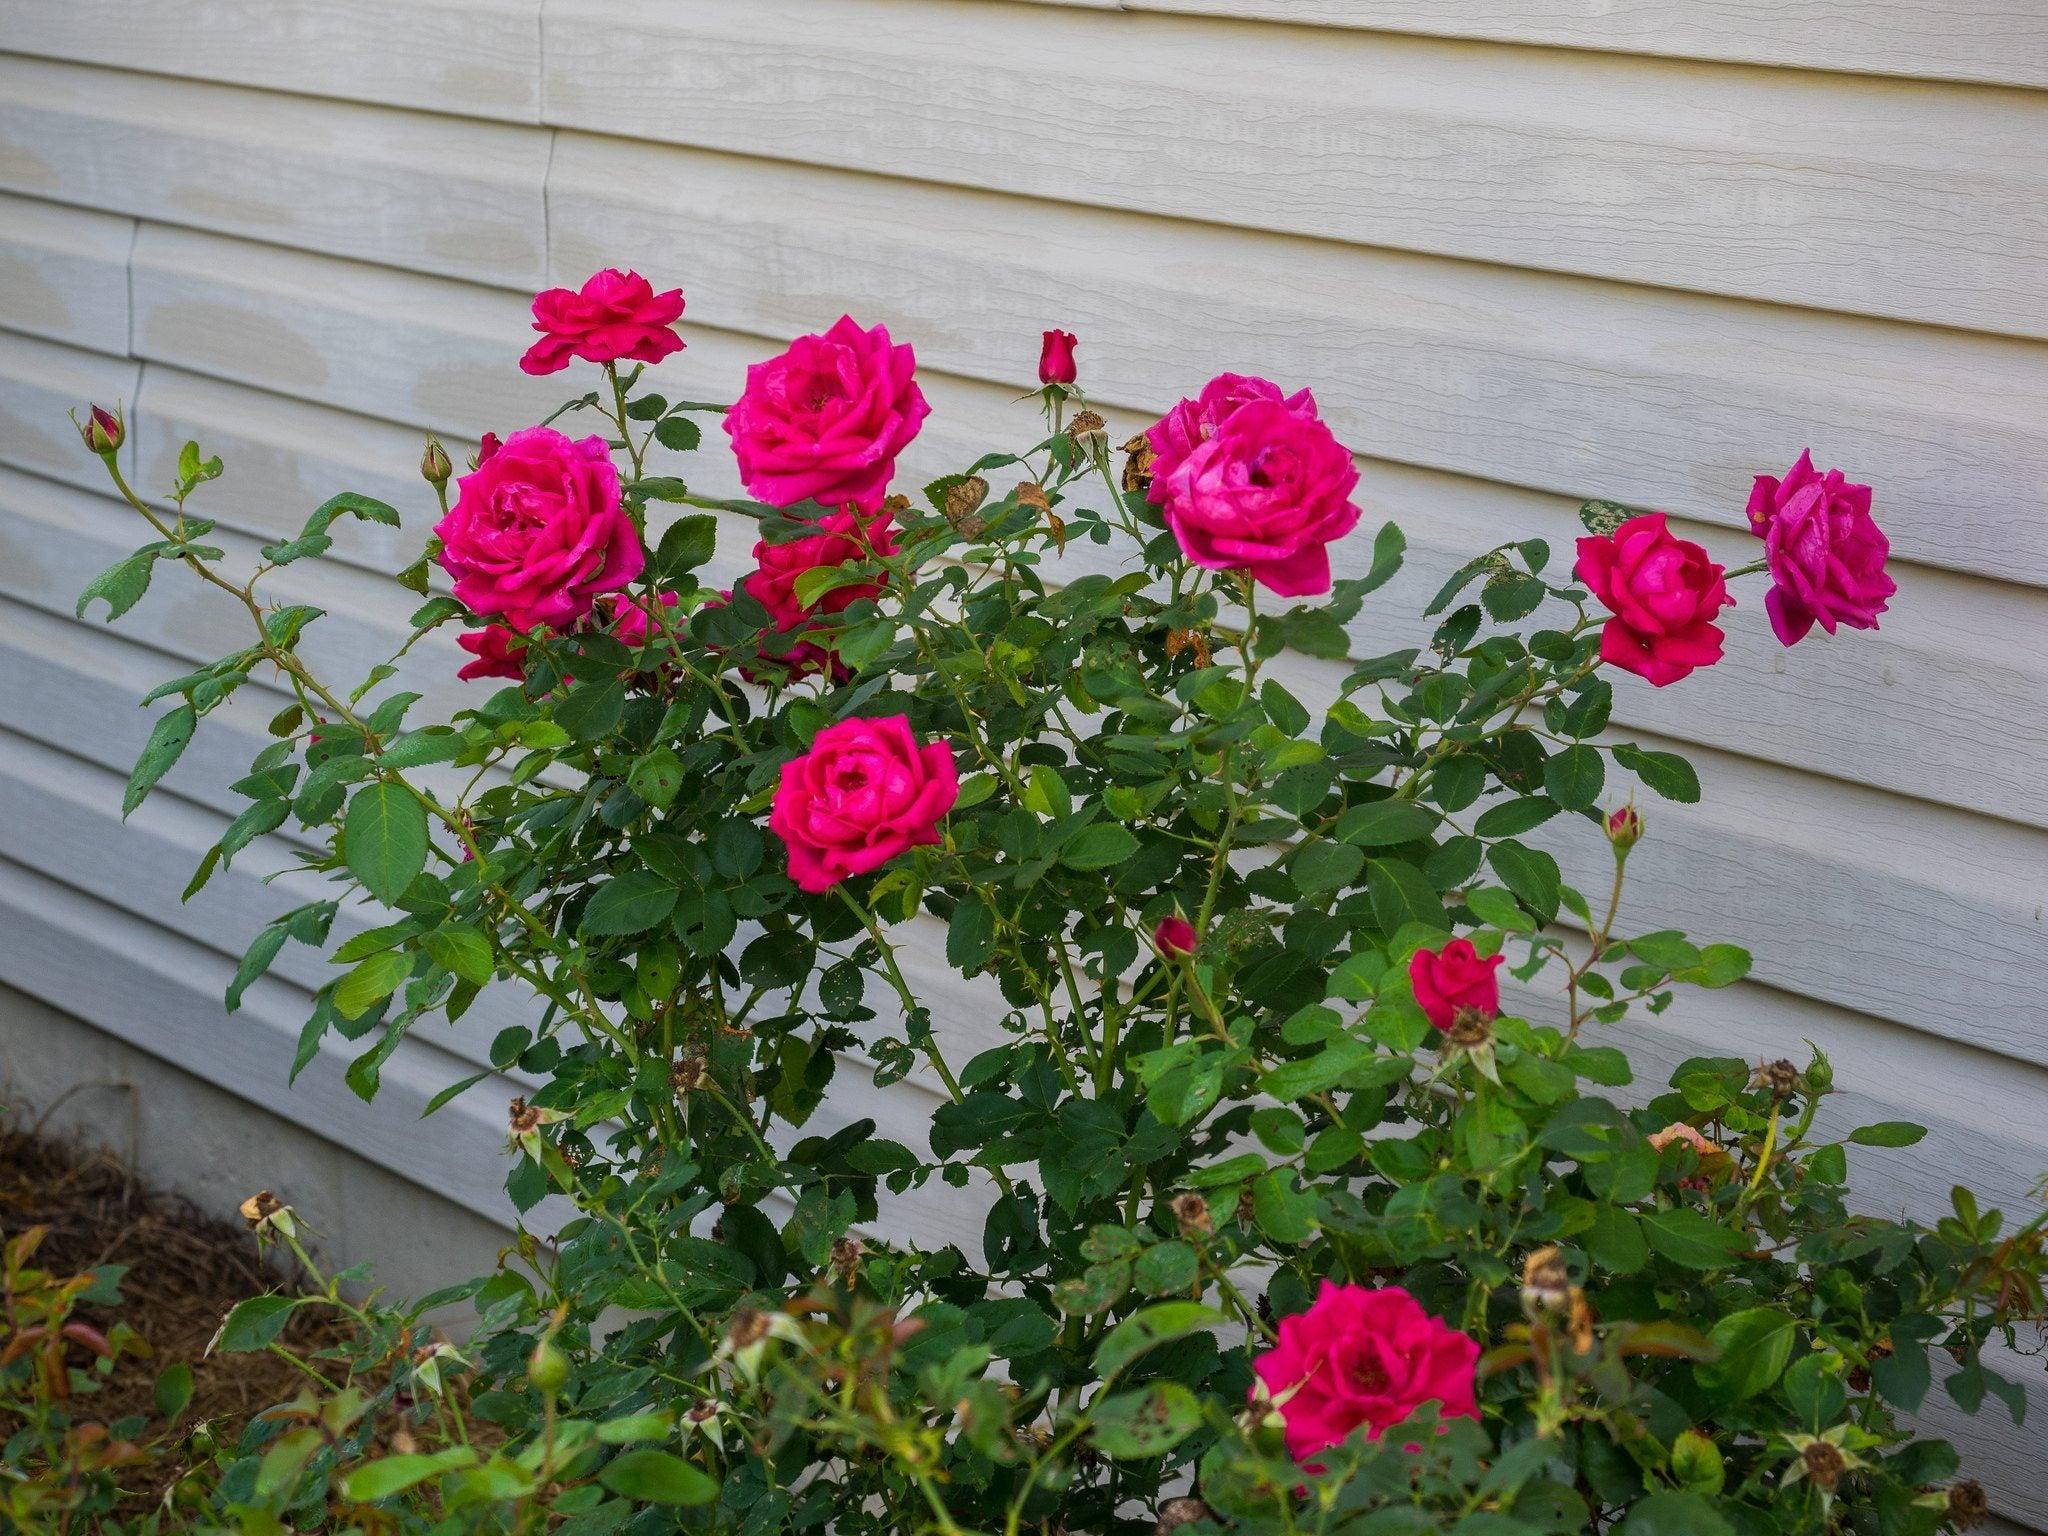 Easy Elegance Rose Information Growing Easy Elegance Roses In The